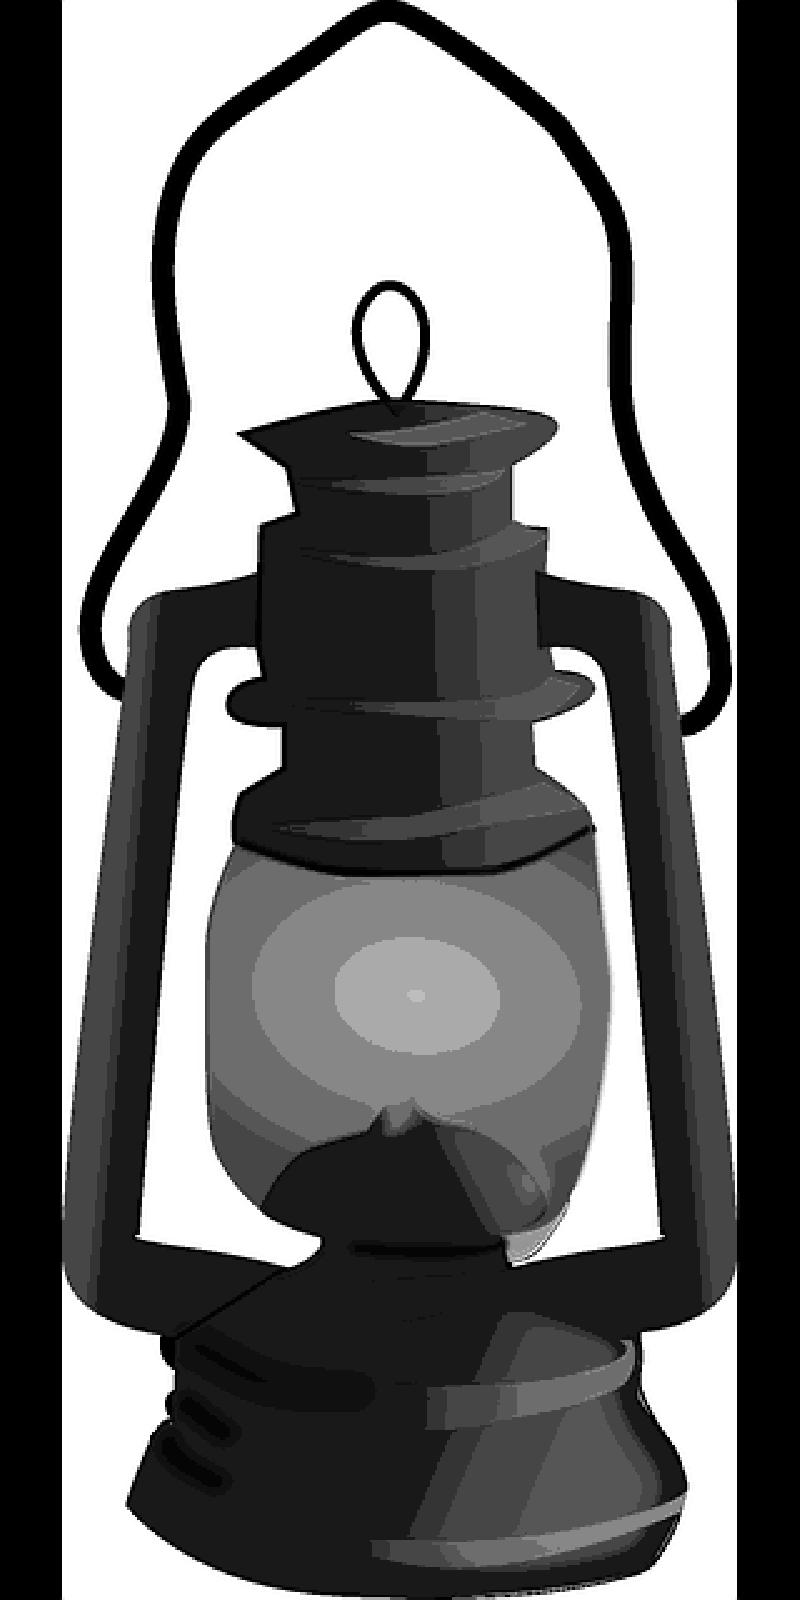 Lantern clipart paraffin lamp. Oil black and white